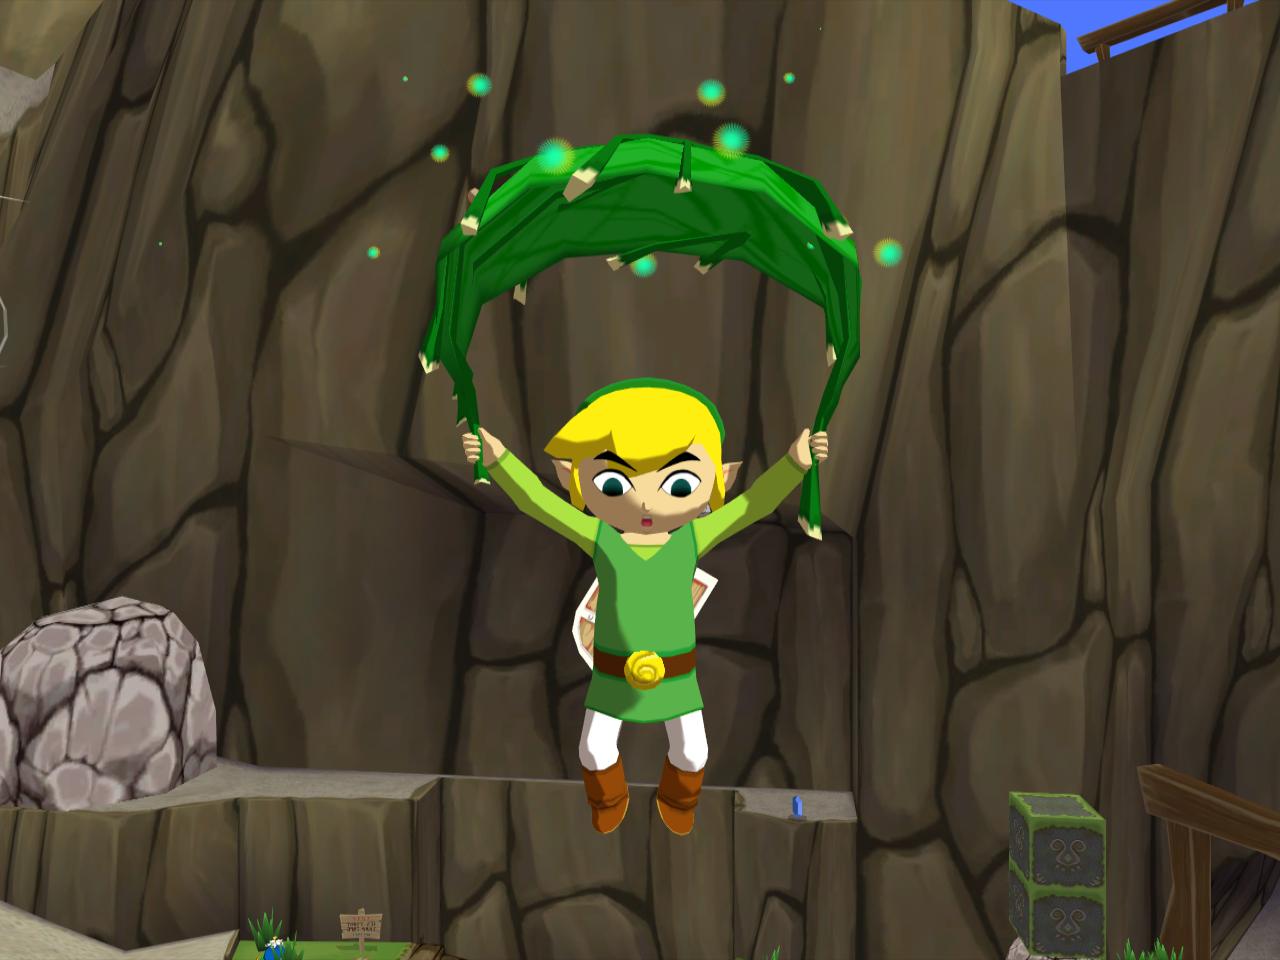 Link using the Deku Leaf to  Toon Link Wind Waker